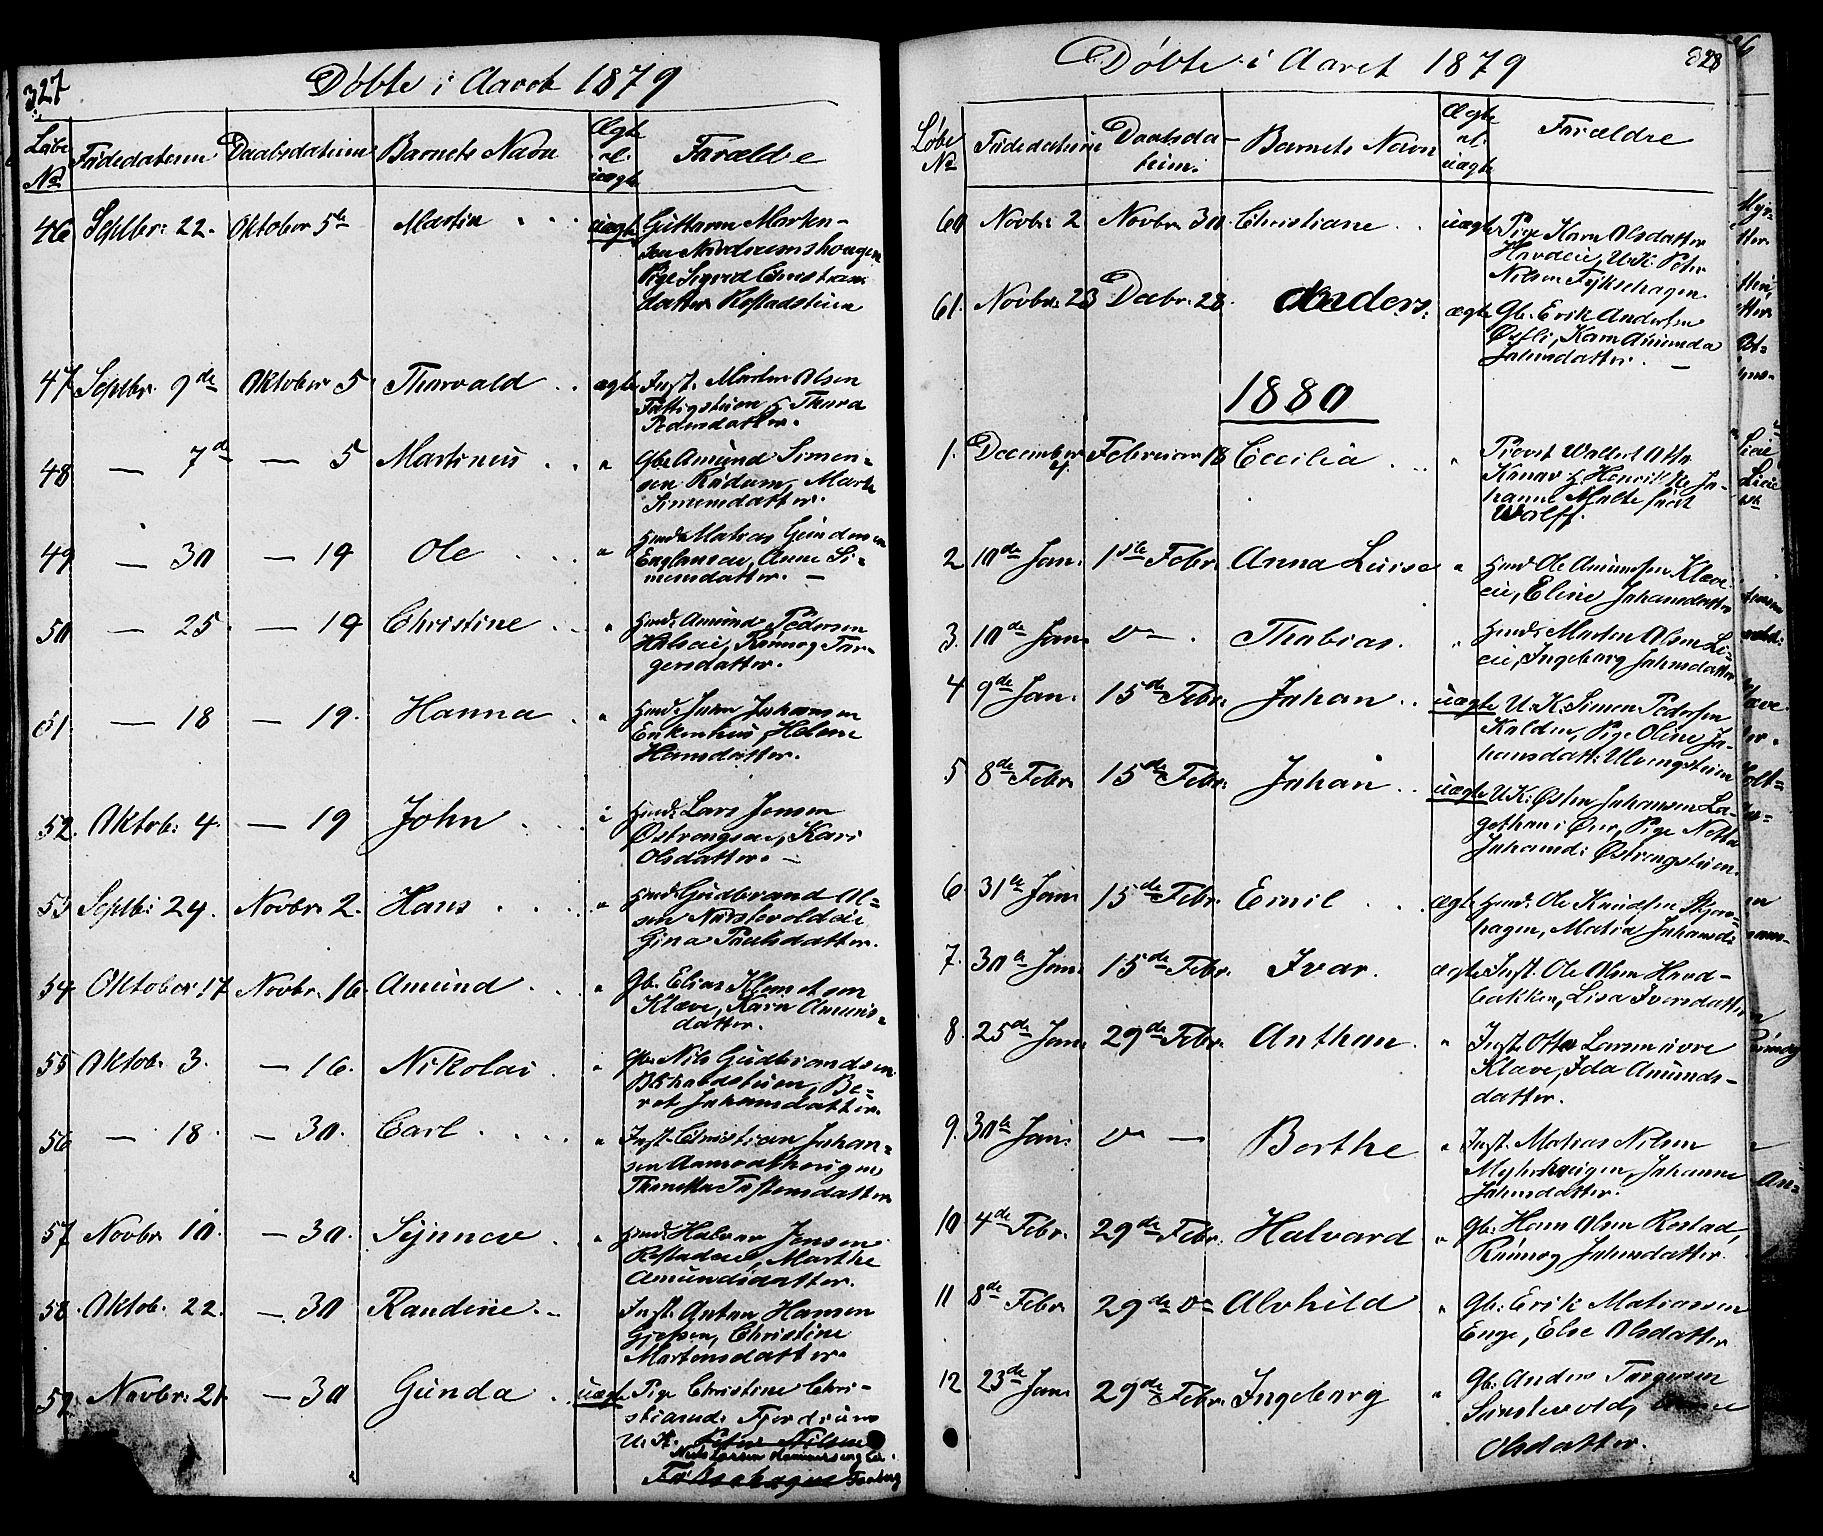 SAH, Østre Gausdal prestekontor, Klokkerbok nr. 1, 1863-1893, s. 327-328